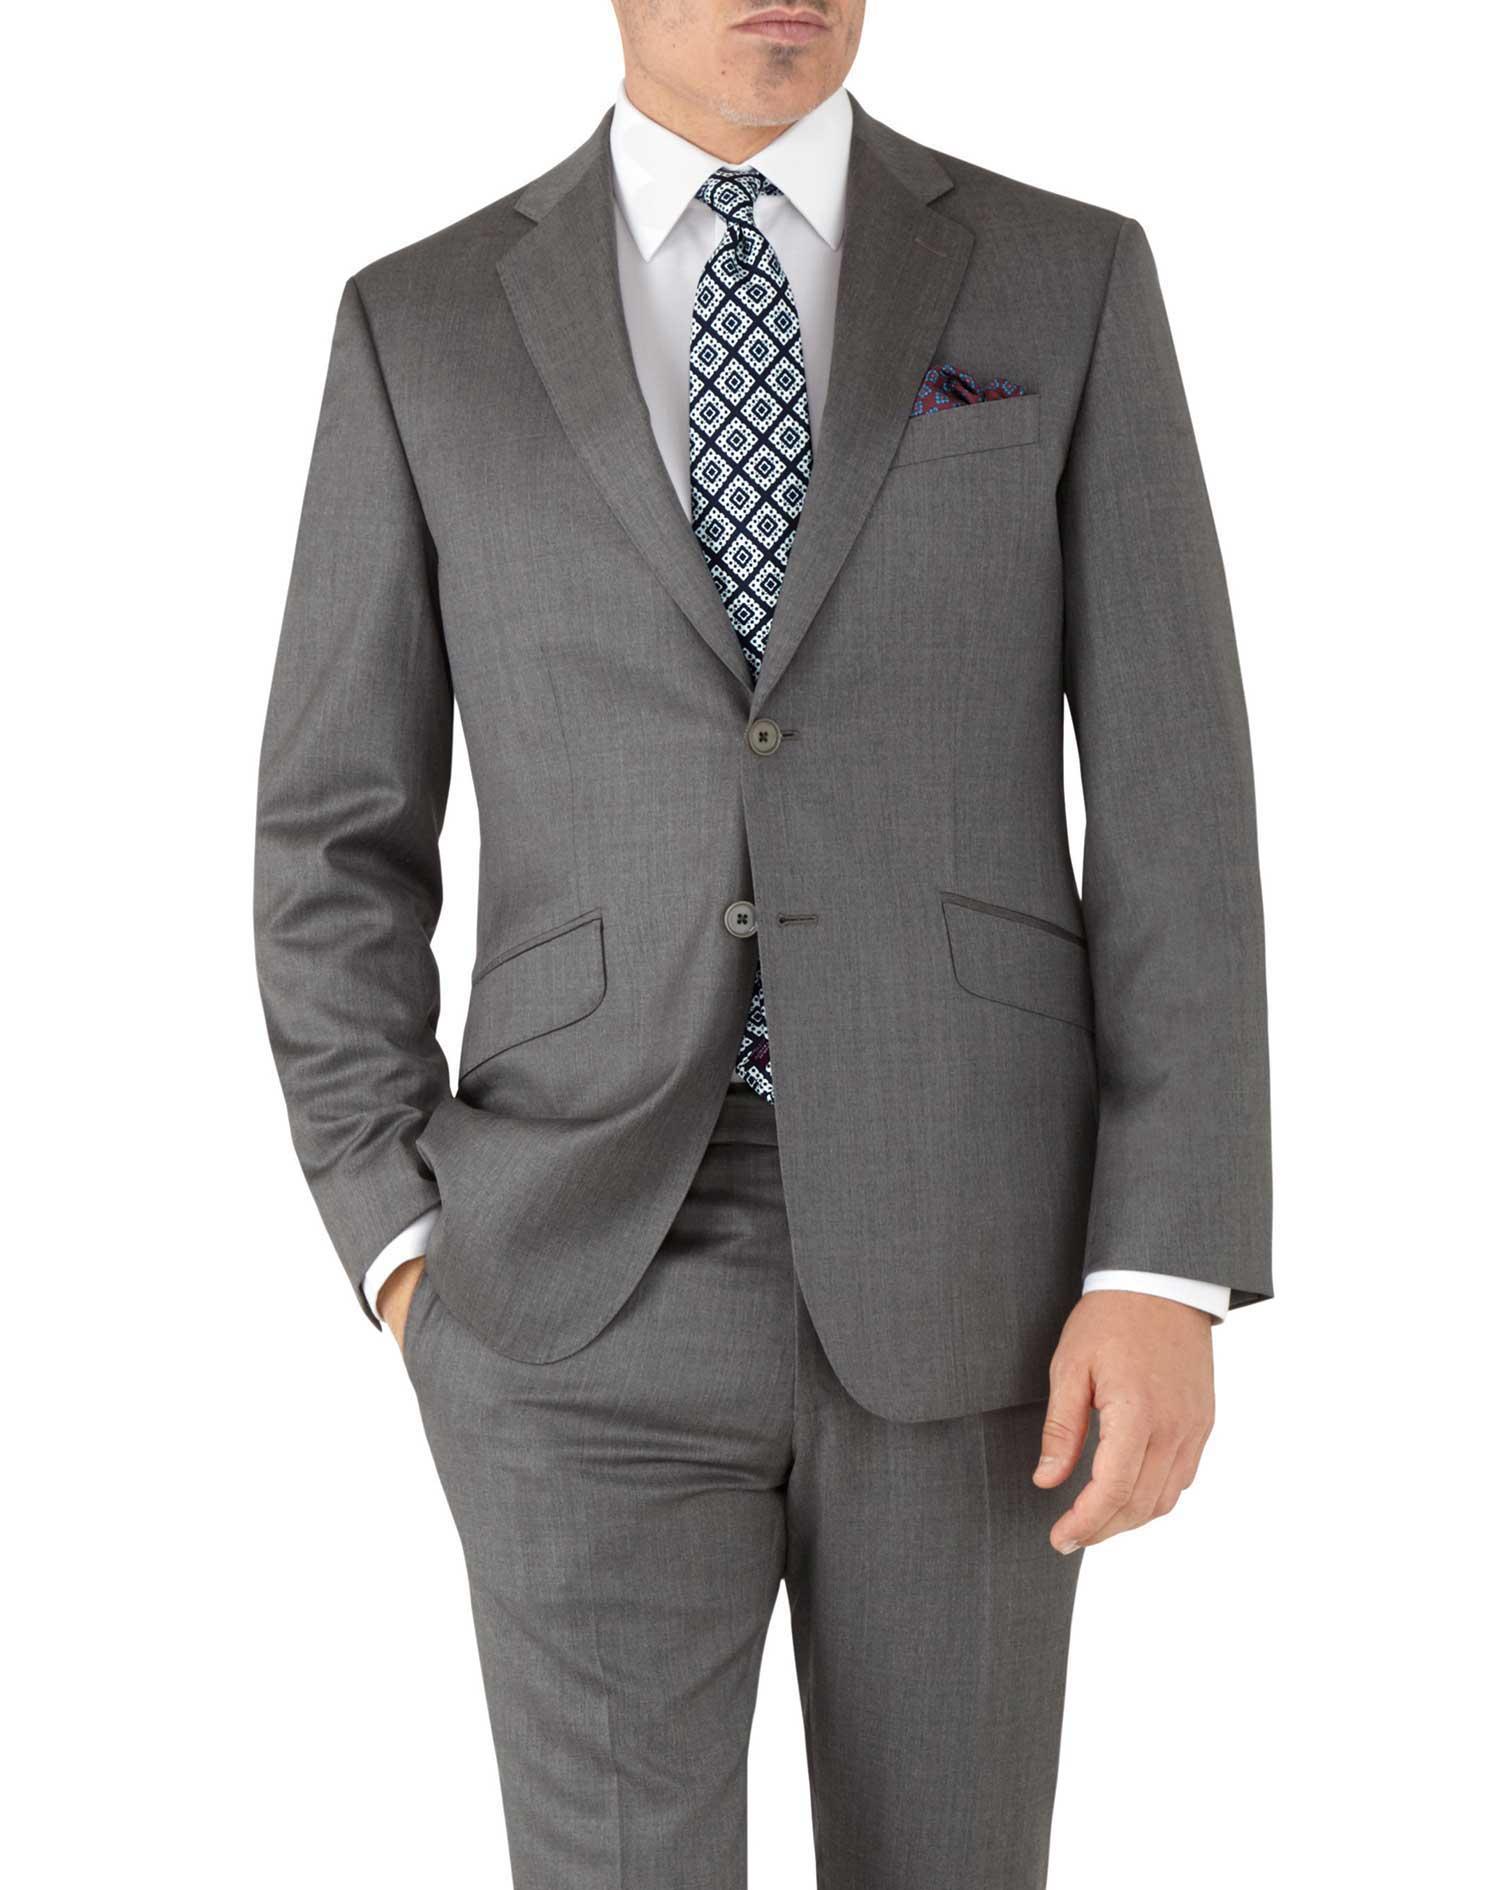 Grey Slim Fit Italian Suit Wool Jacket Size 42 Short by Charles Tyrwhitt